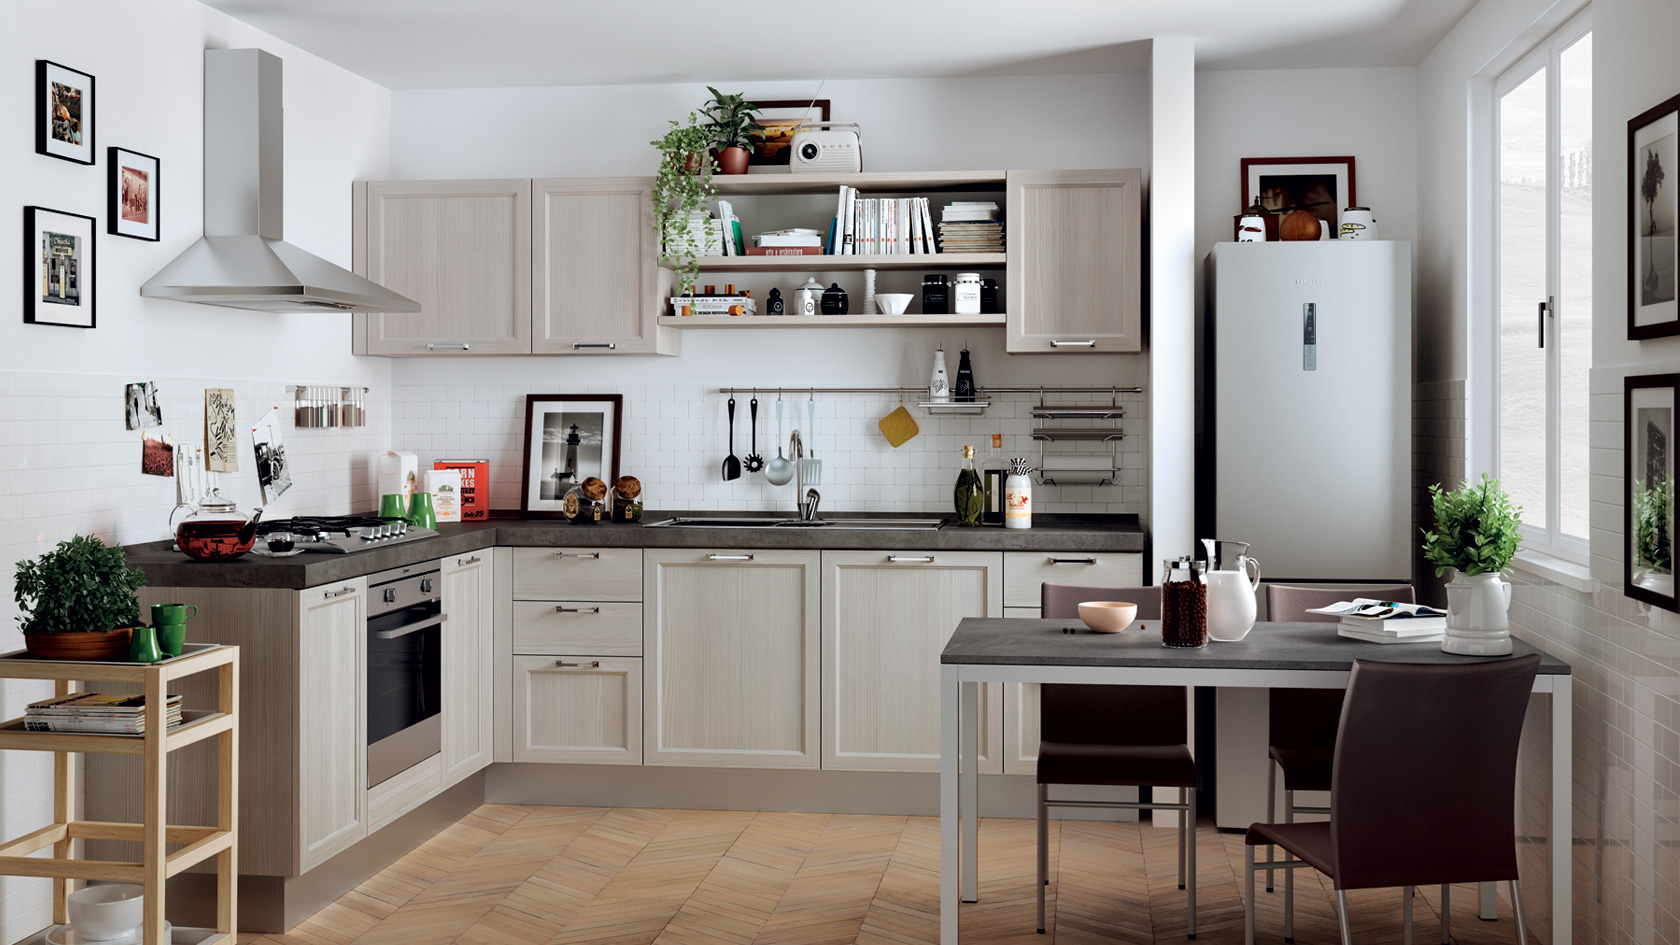 Best Ante Cucina Prezzi Ideas - Home Design - joygree.info